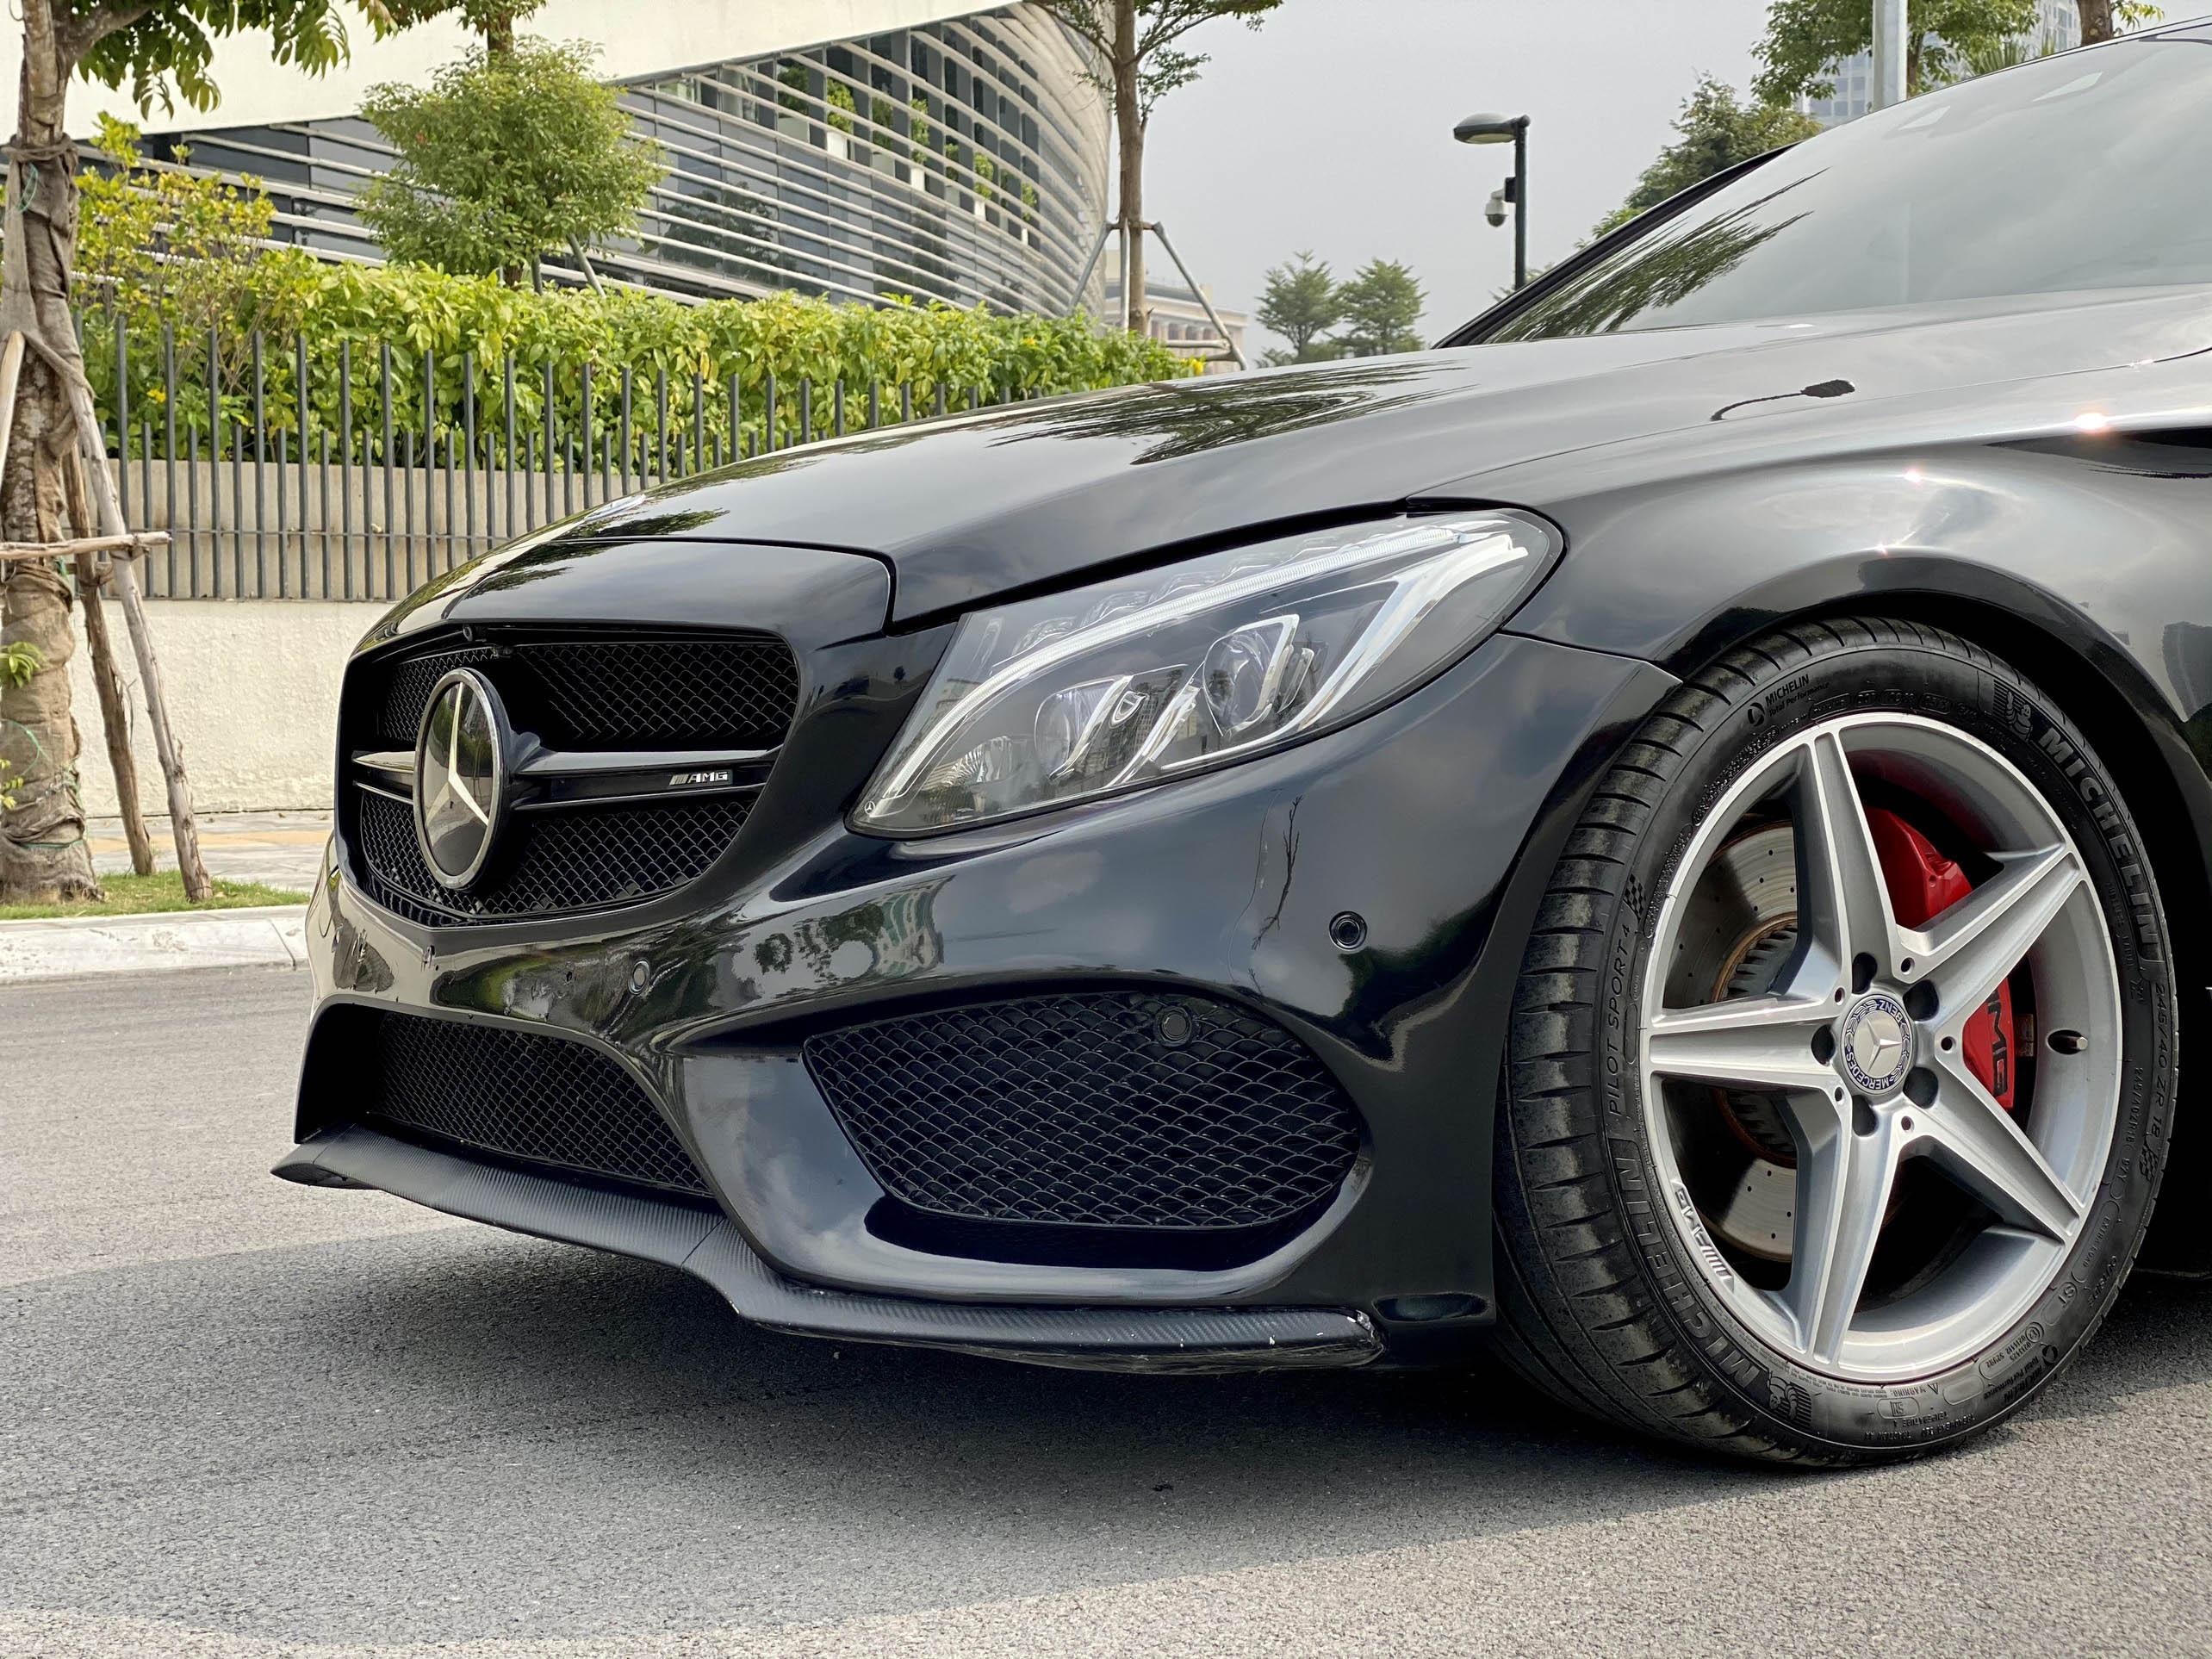 Mercedes C300 AMG Sản Xuất 2016